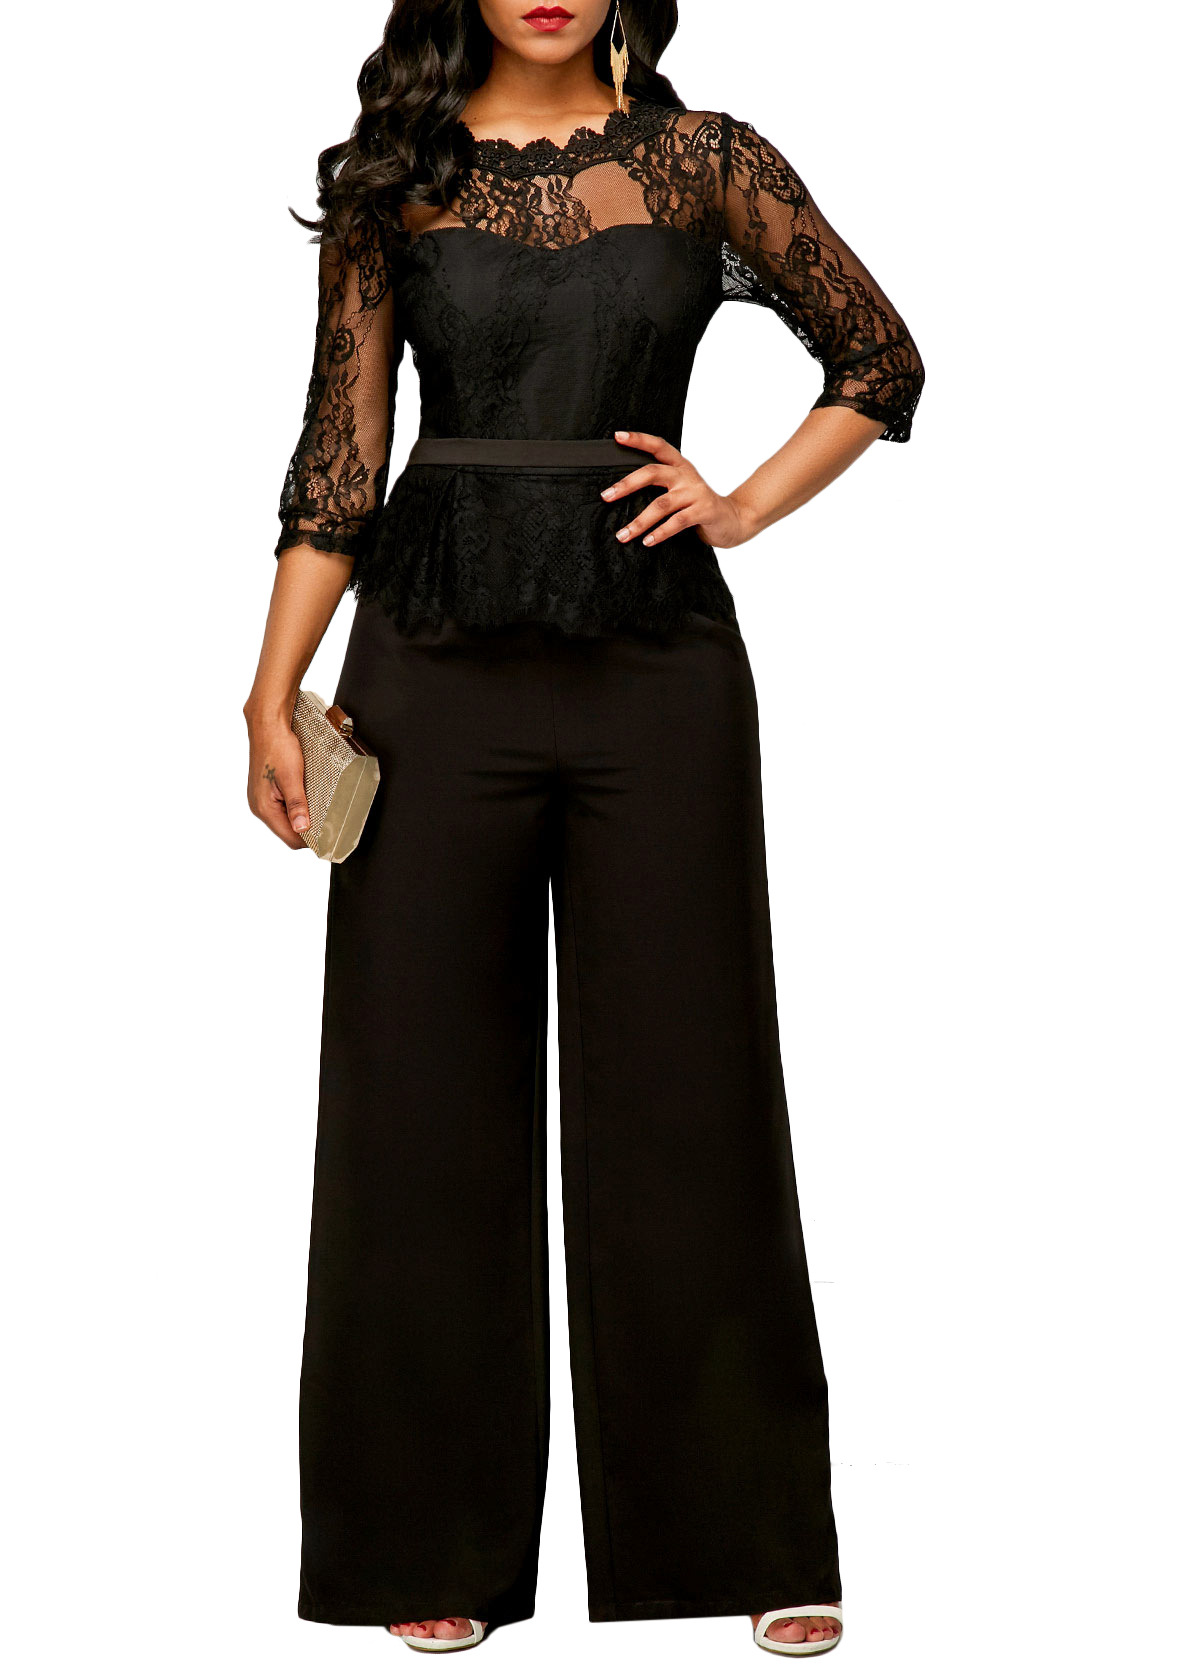 Spring Summer 2019 Fashion Elegant Sexy Lace Jumpsuit Romper Women Short Sleeve Female Overalls Long Pants Plus Size